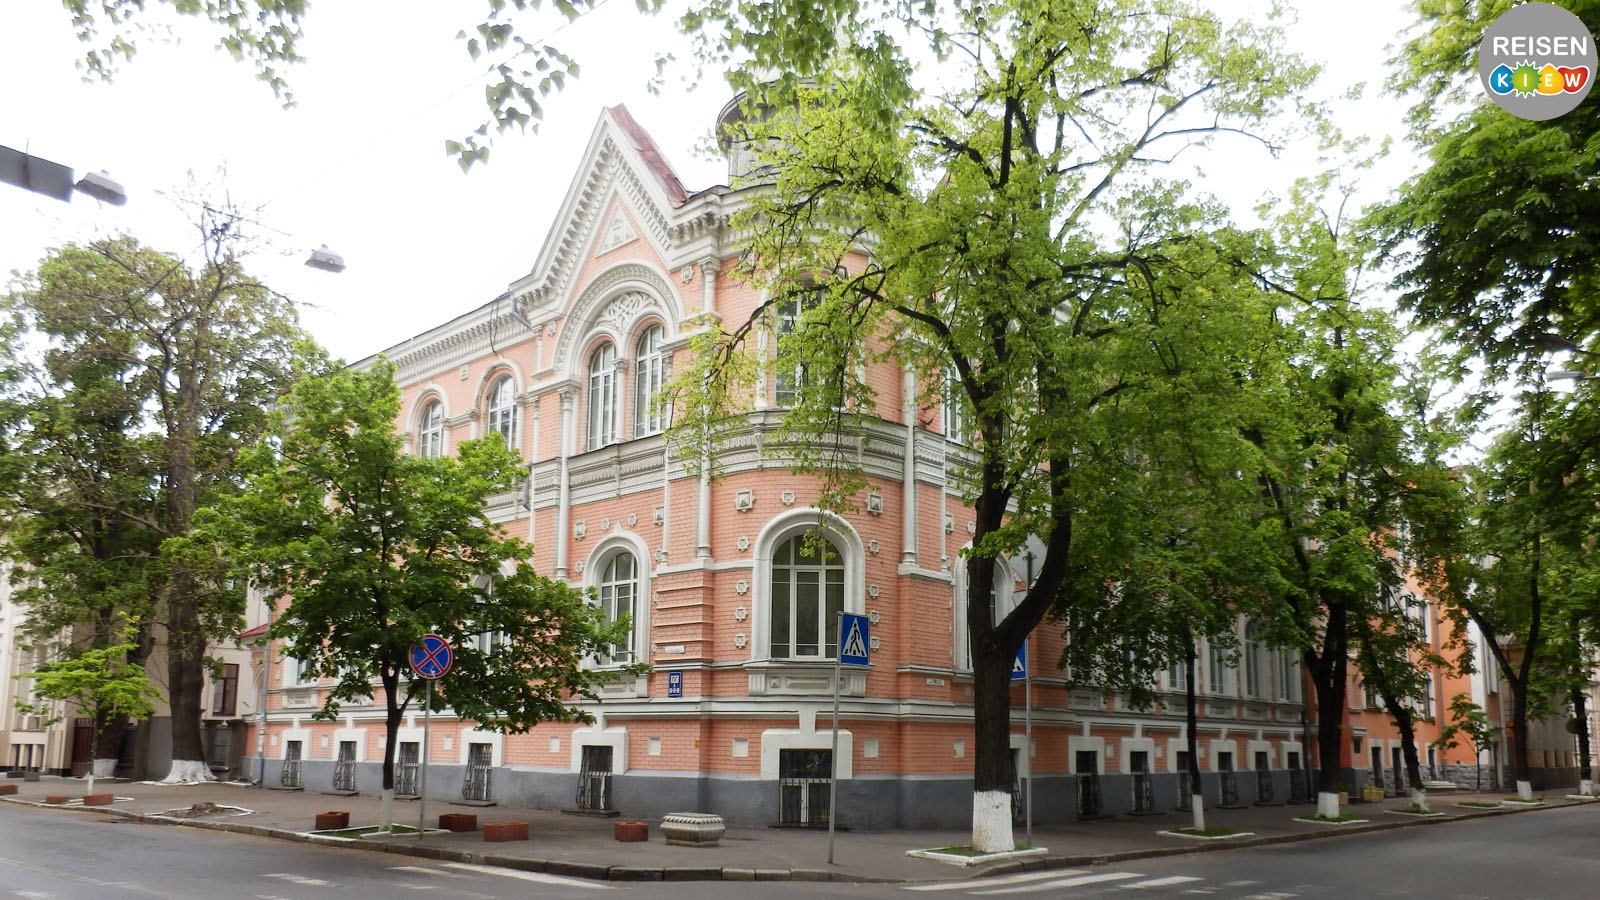 Gebäude der ehemaligen Nikolaj-Bunge-Handwerkerschule in Kiew